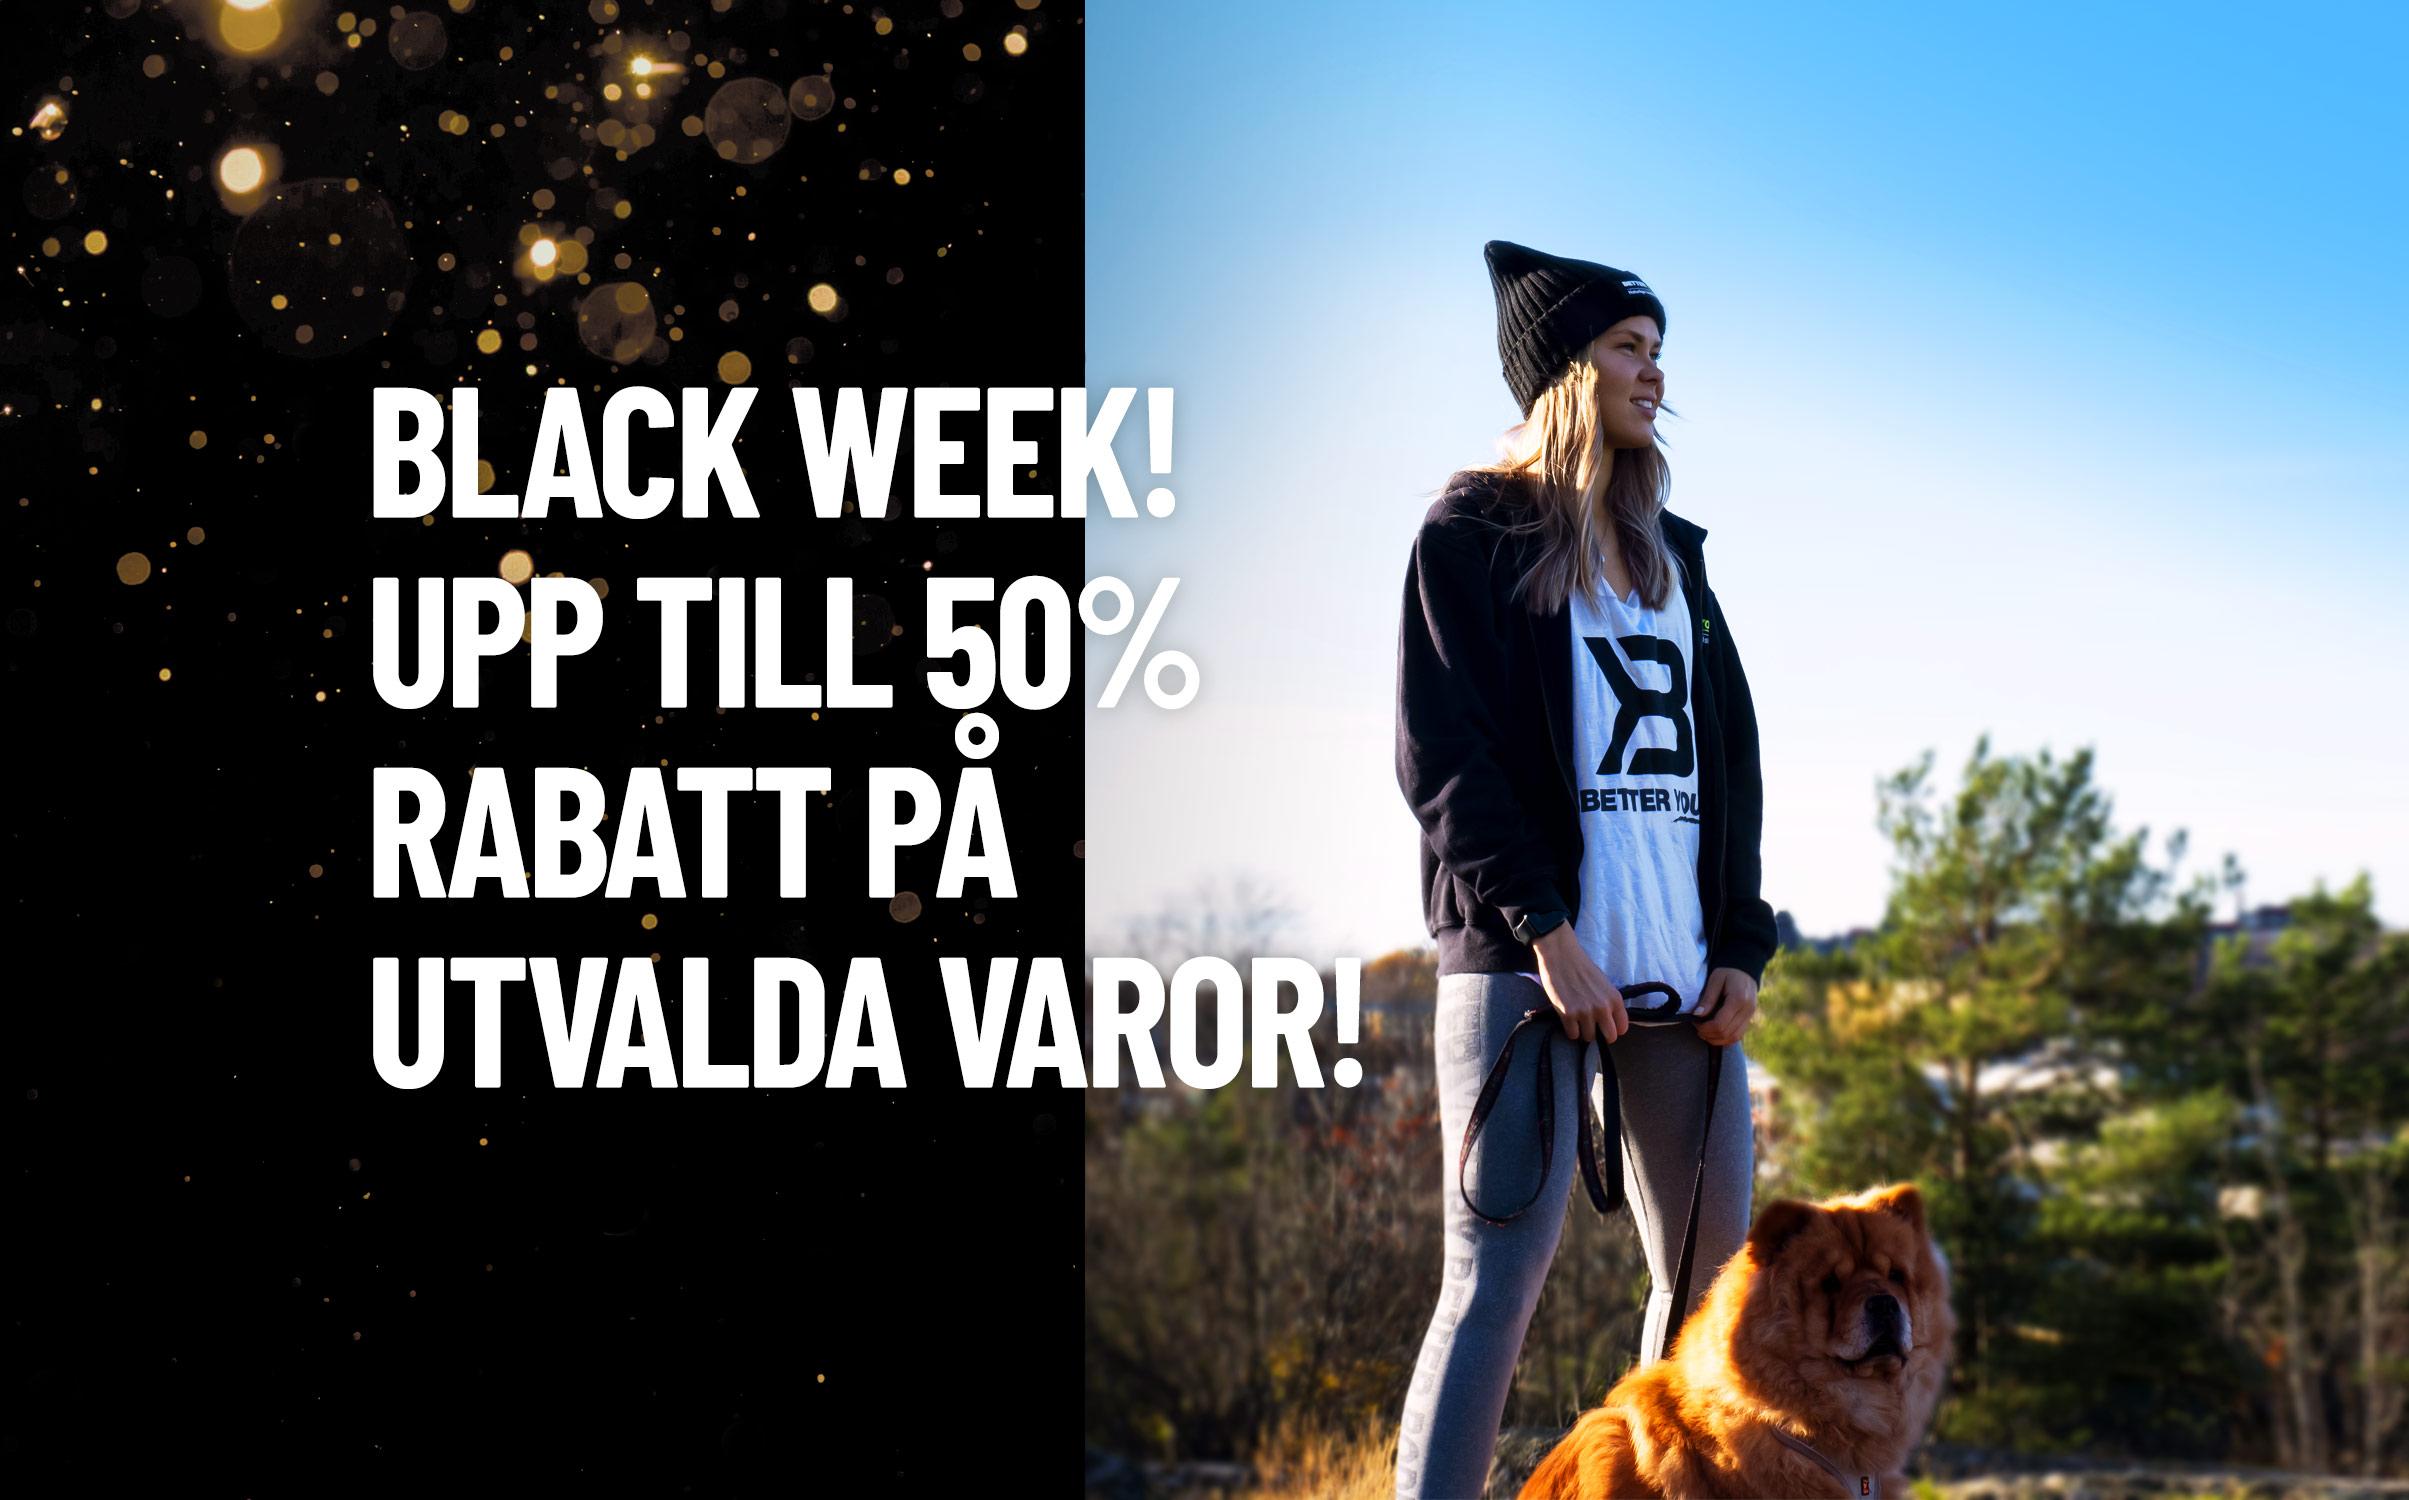 https://www.betteryou.se/pub_docs/files/Custom_Item_Images/Stora_snurr_1_black_week.jpg